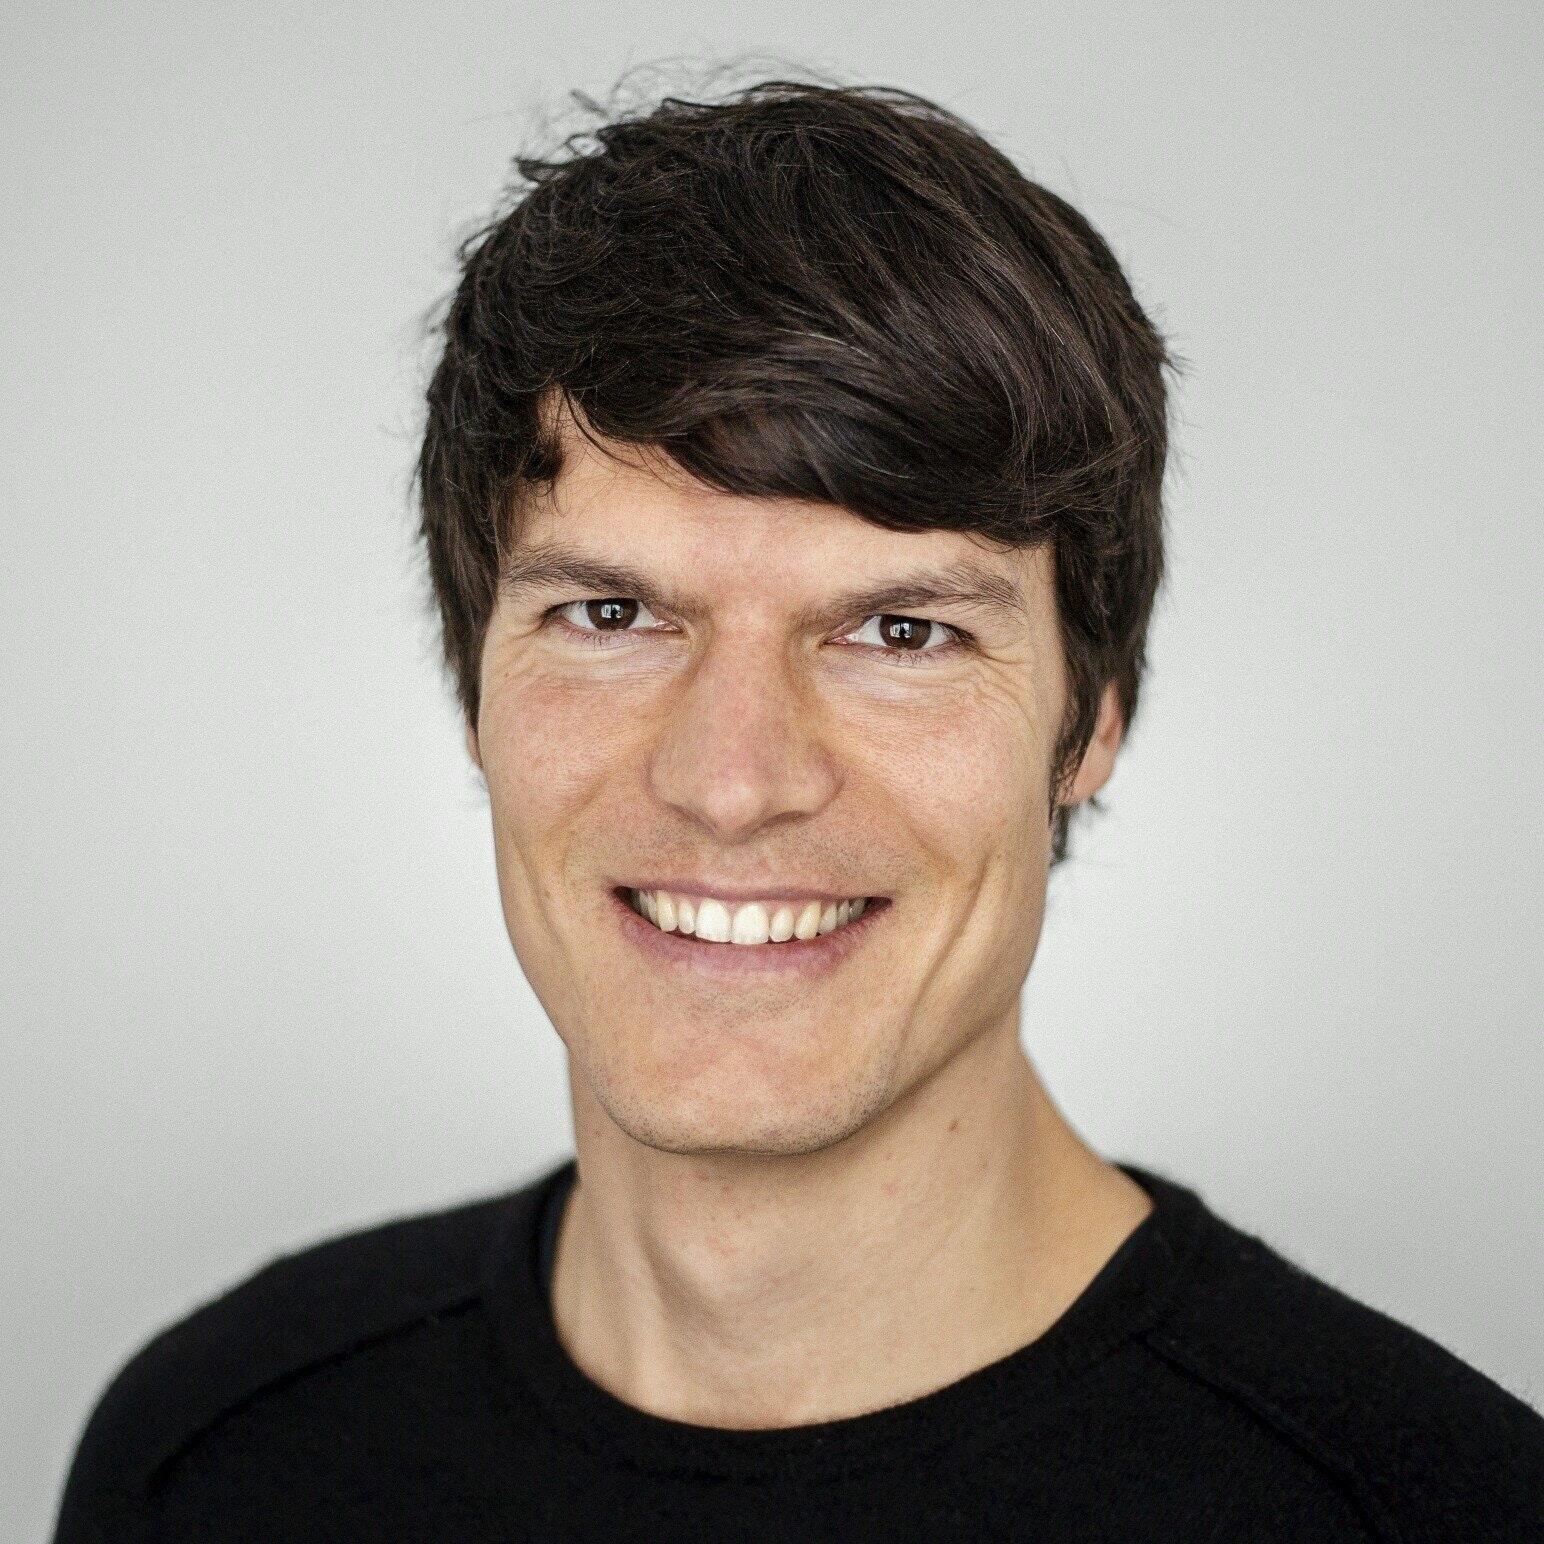 Christian Vollmann